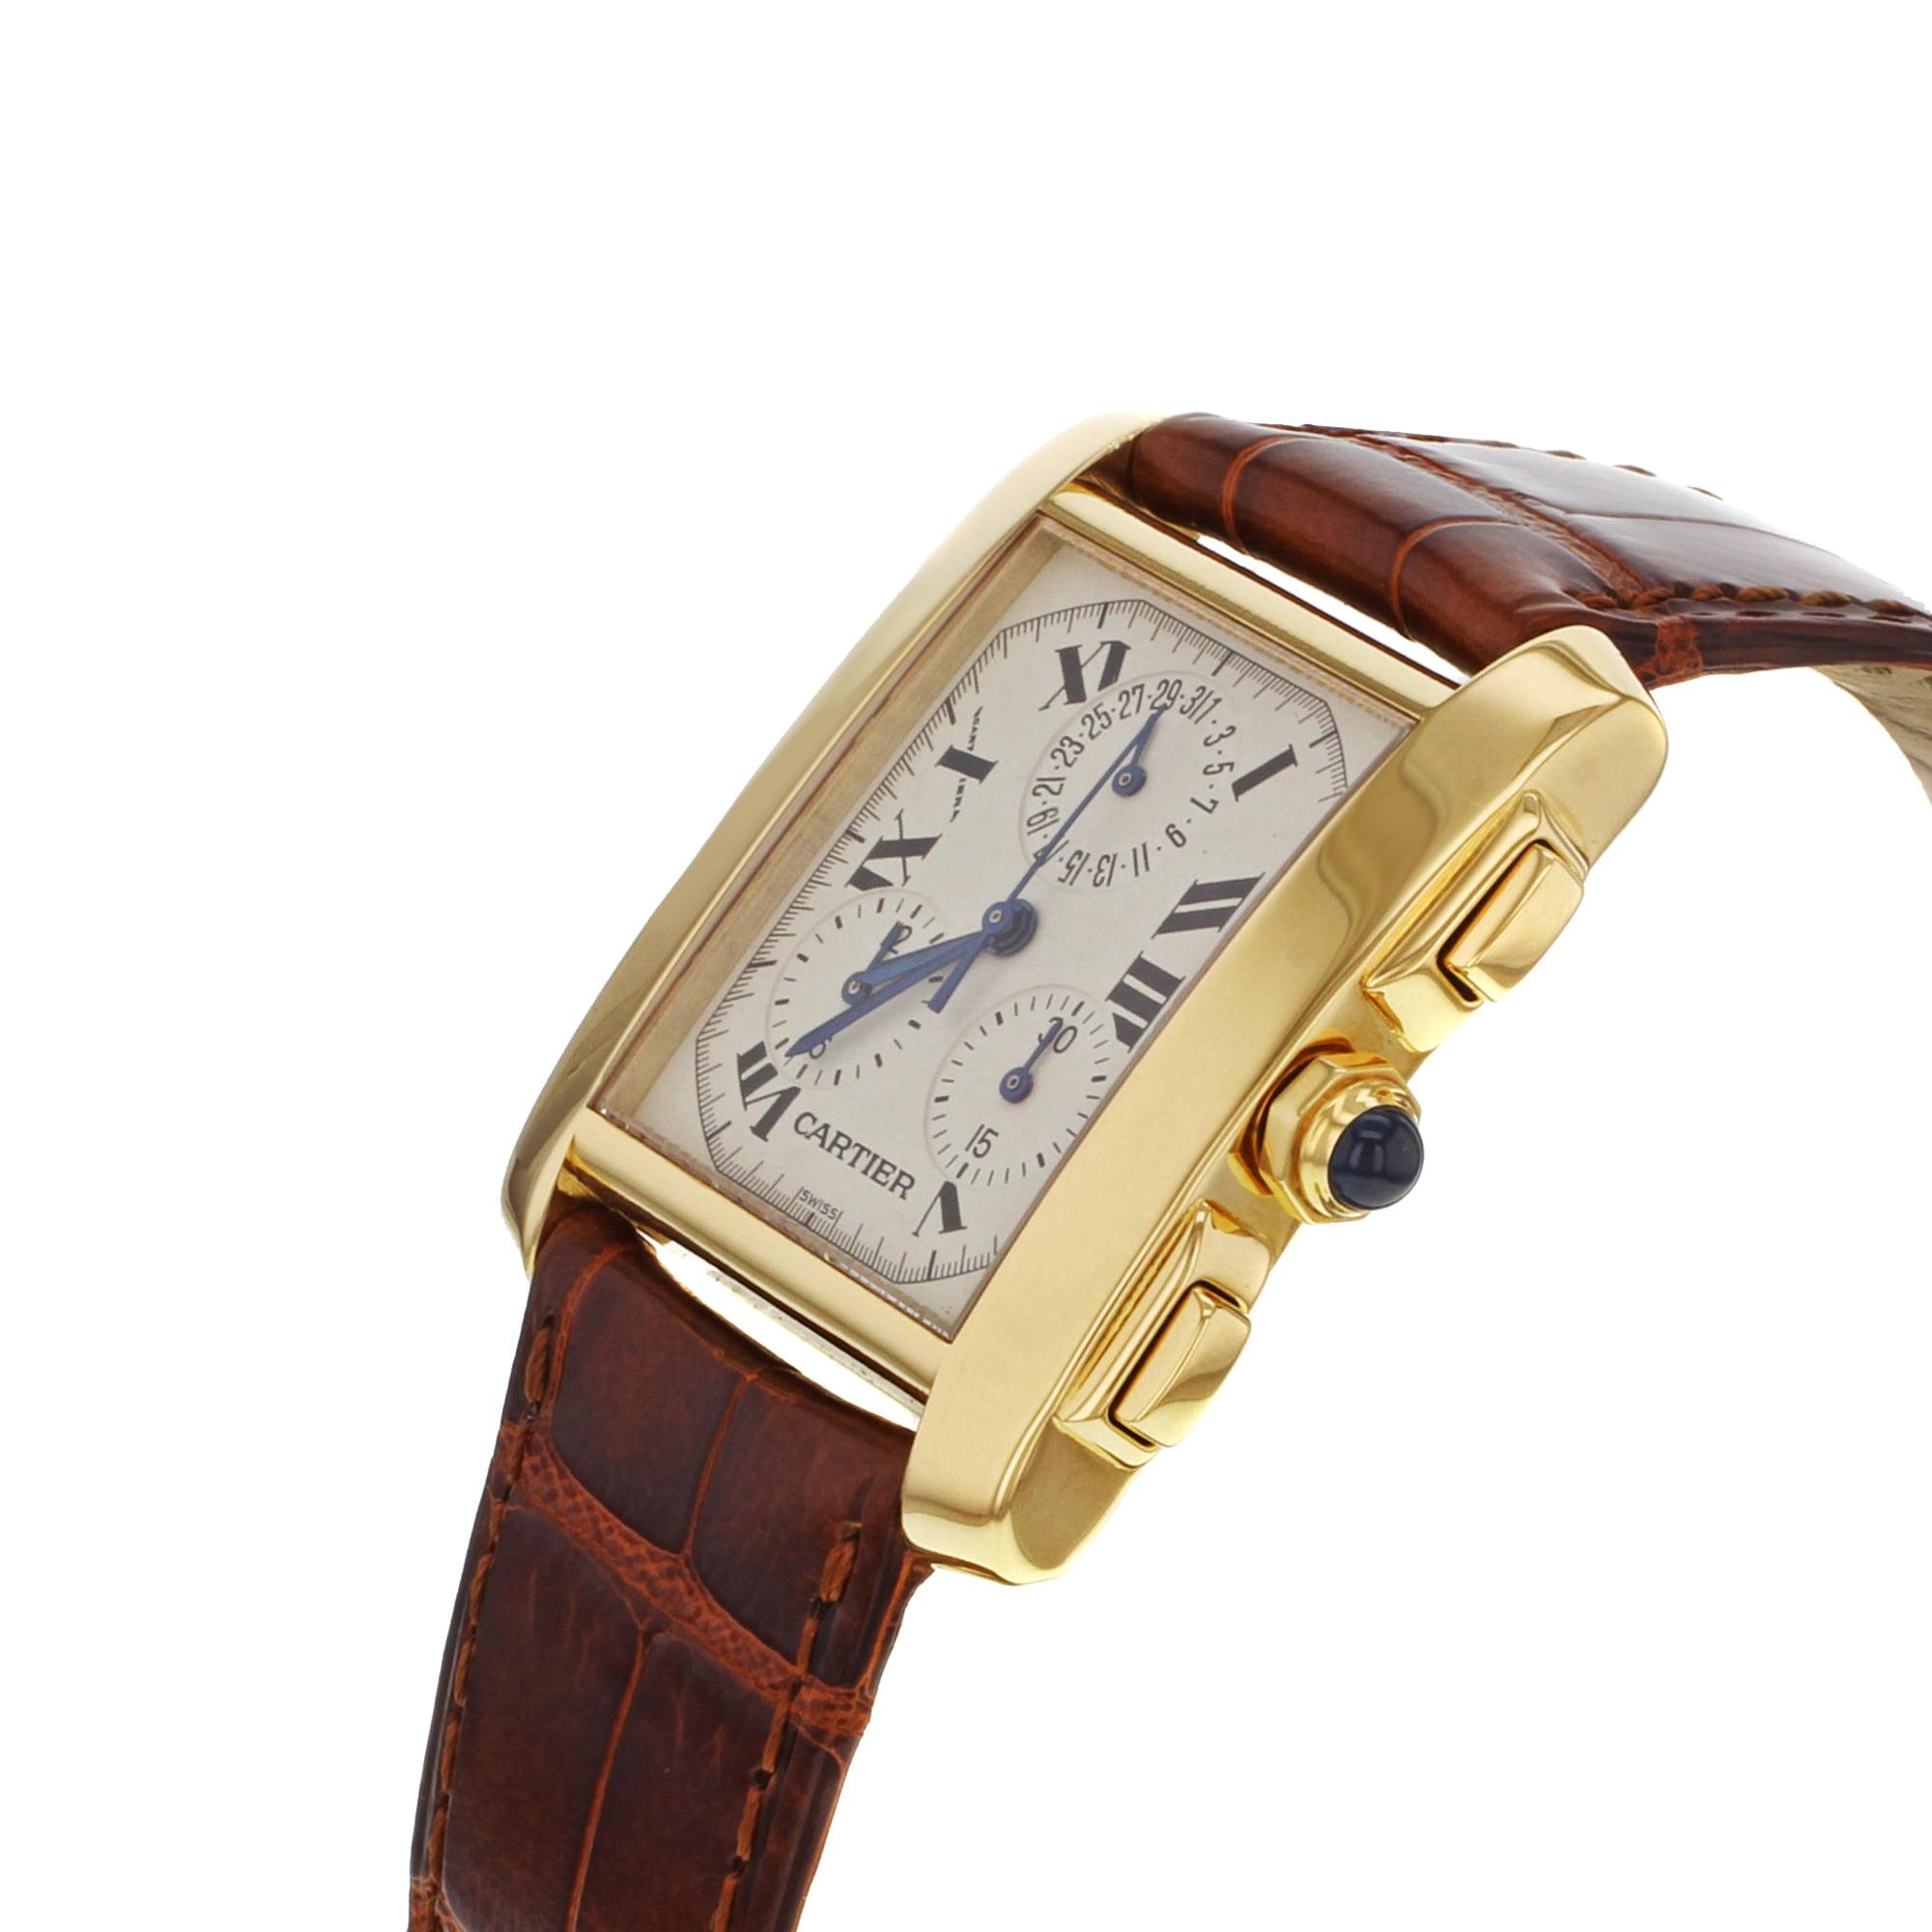 efd53bd834c Cartier - Cartier Tank Francaise Chronoflex W5000556 18K Yellow Gold Quartz  Watch (Pre-owned) - Walmart.com